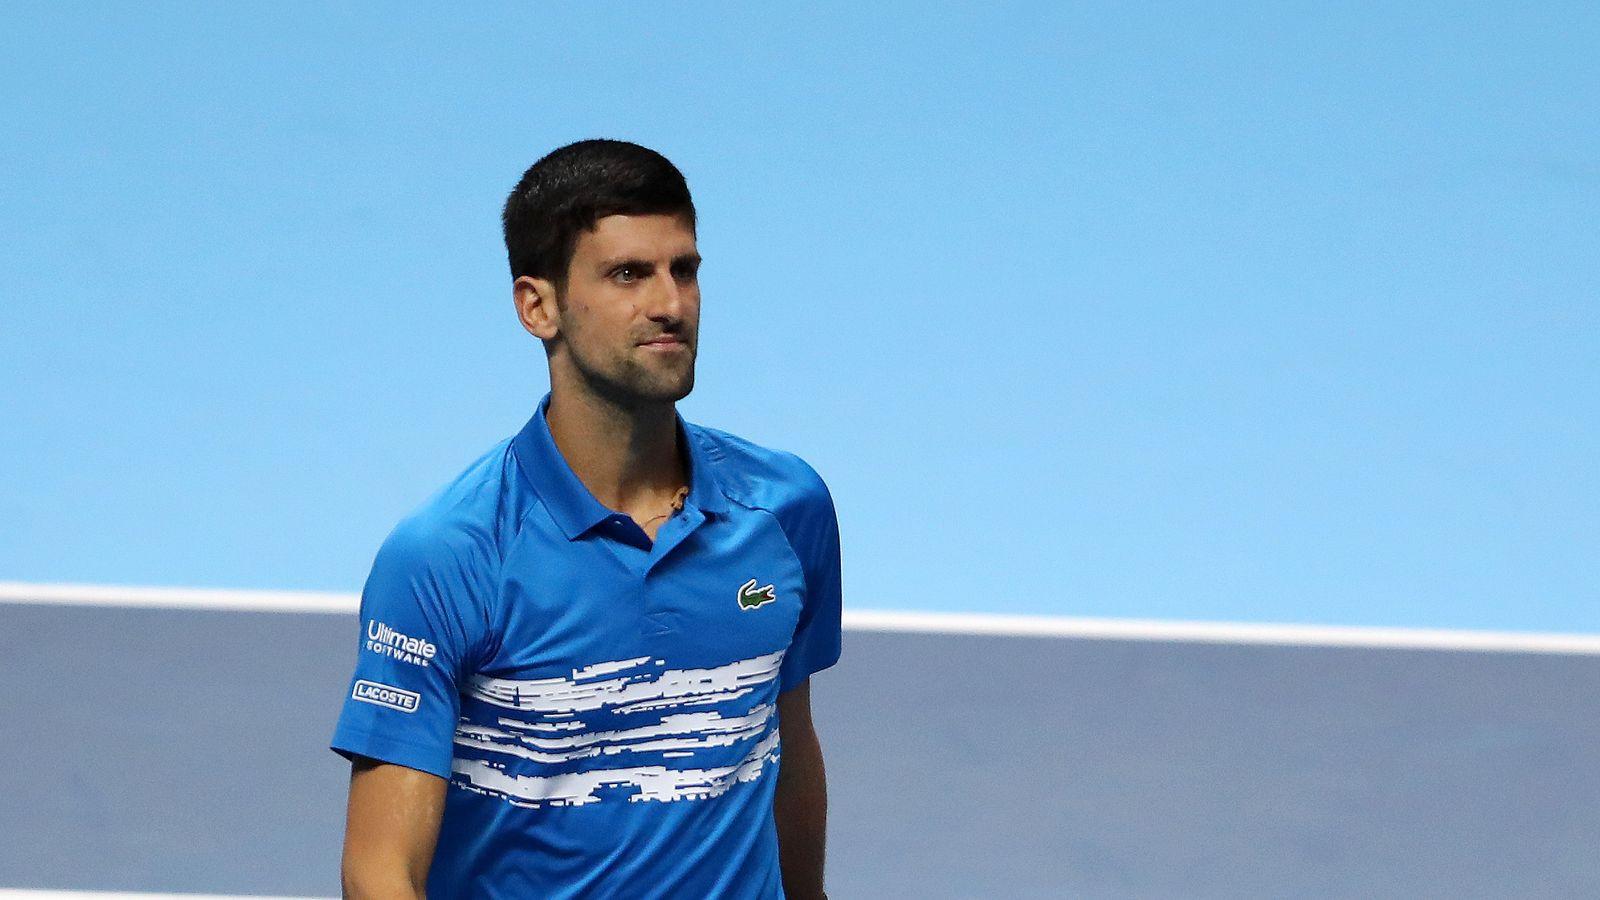 ATP Finals: Novak Djokovic allays elbow injury concerns after Roger Federer defeat - Sky Sports